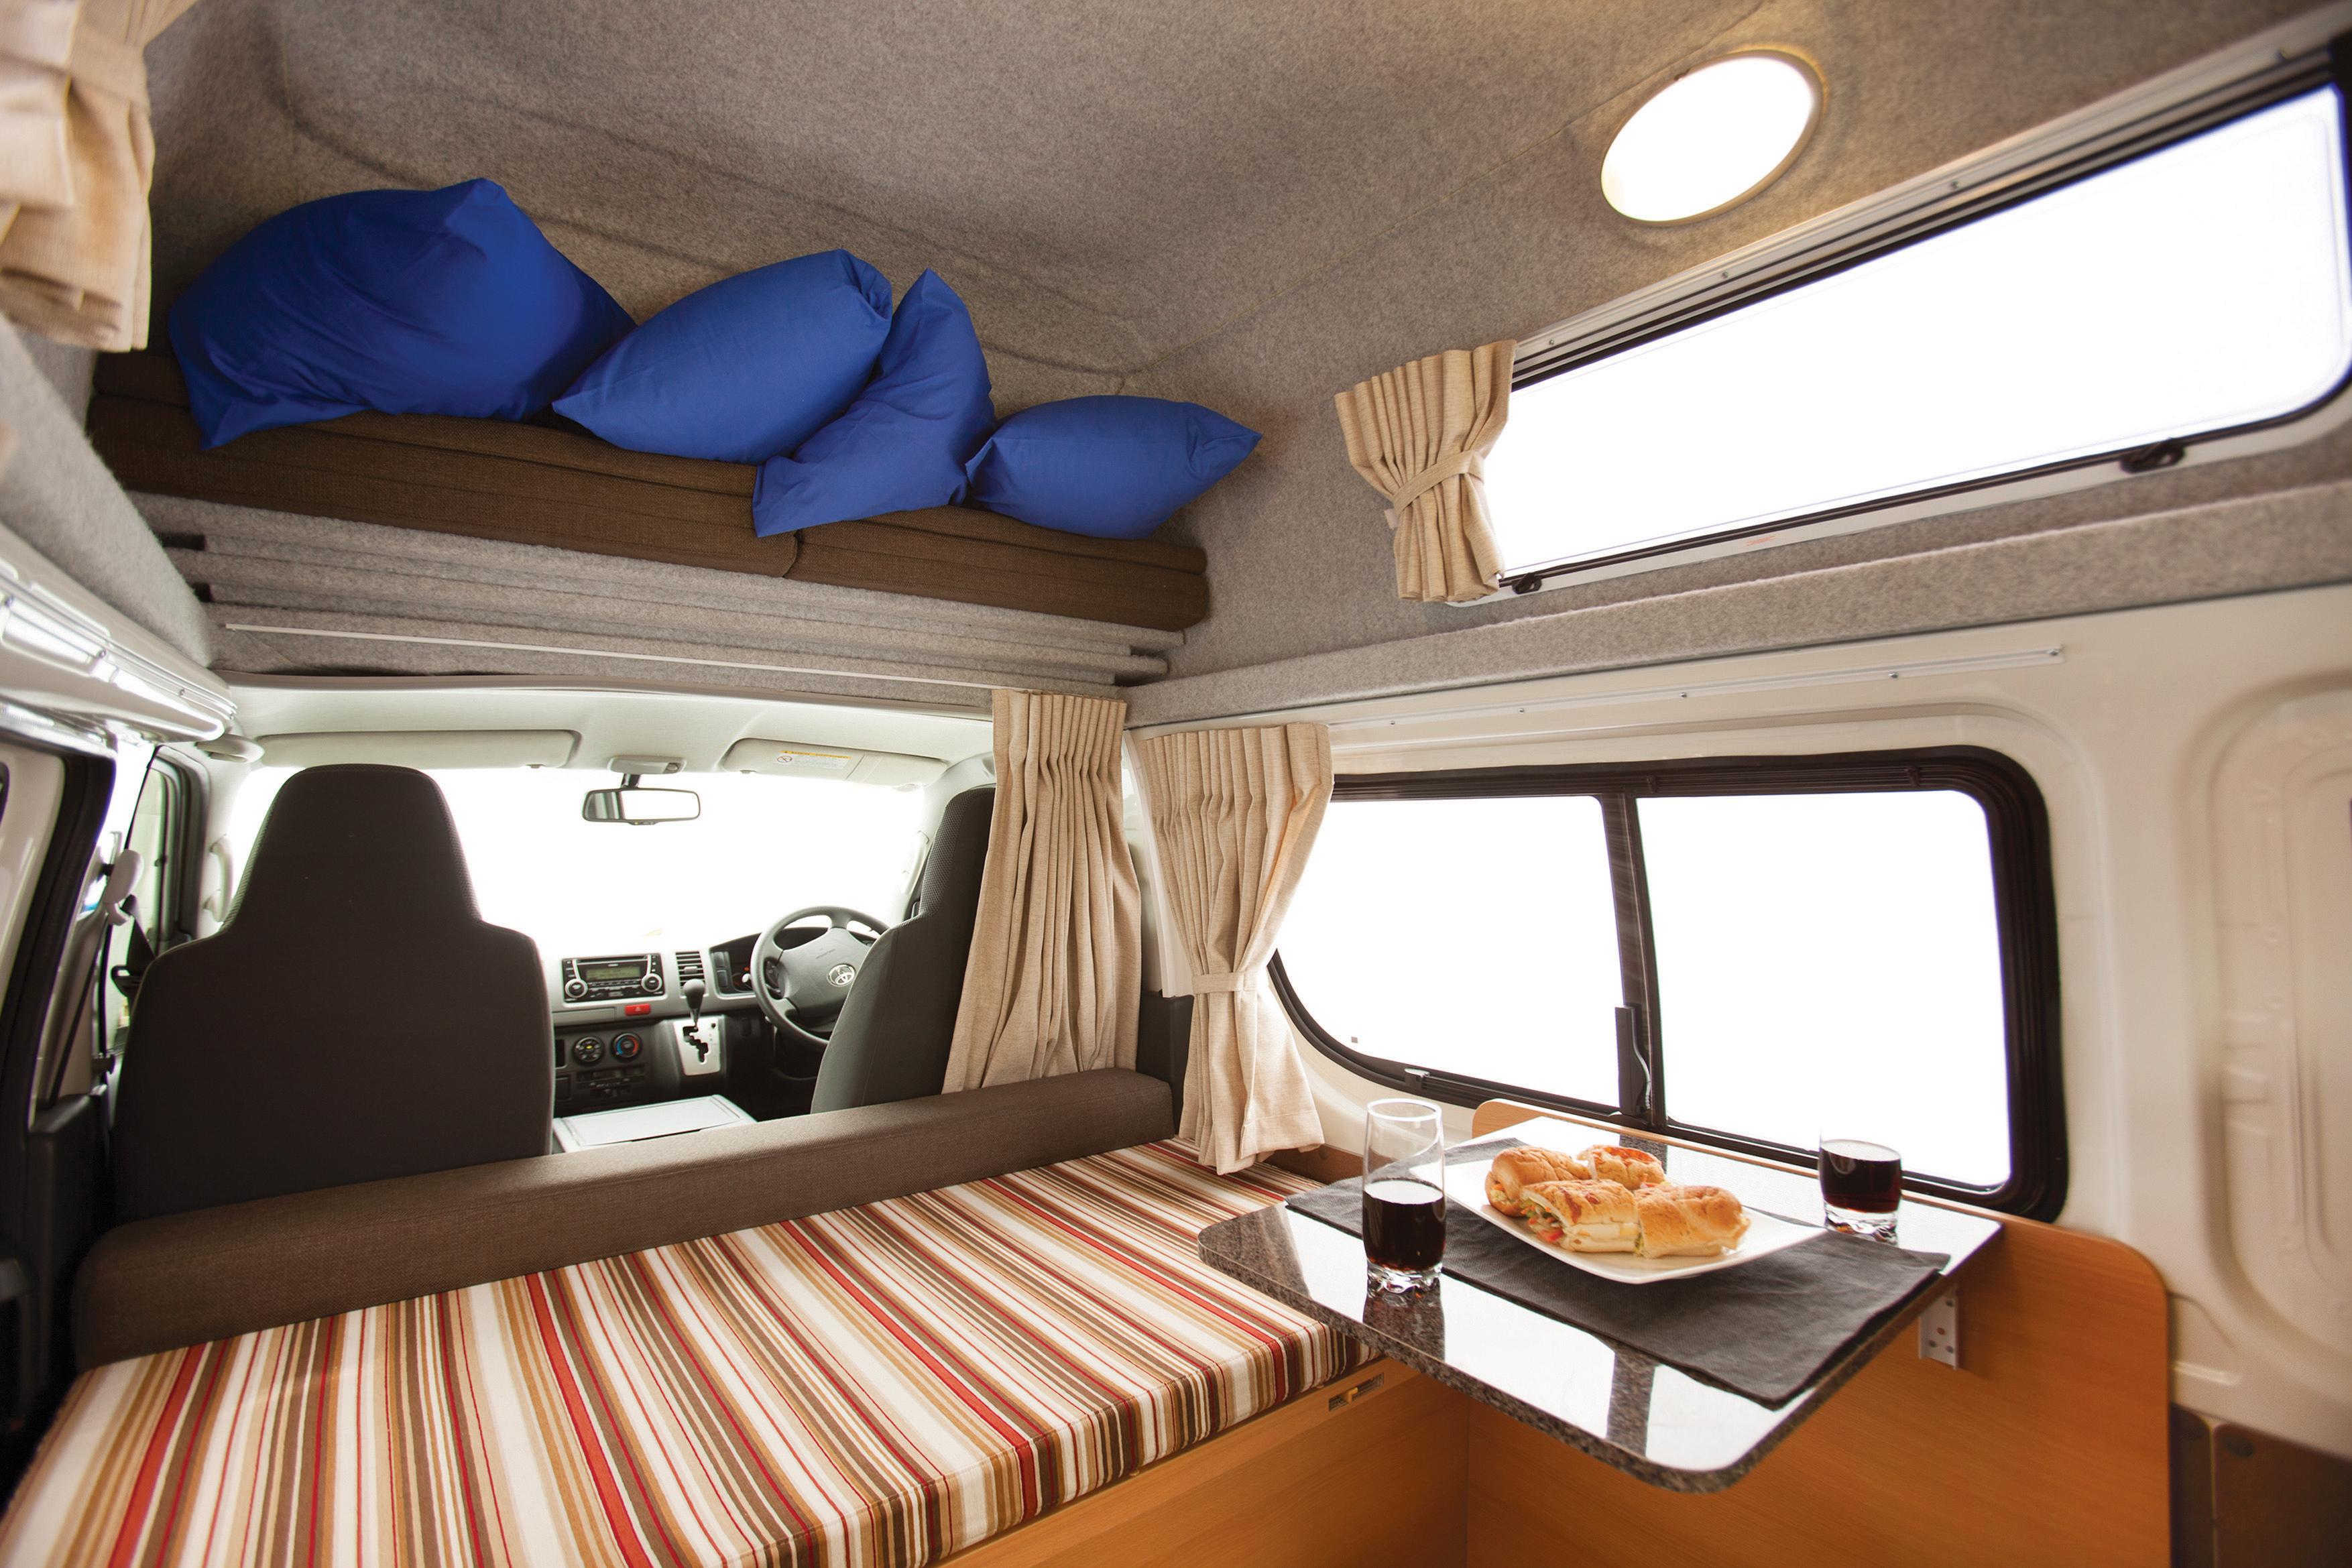 Endeavour Camper Australian Campervan Rental With Apollo